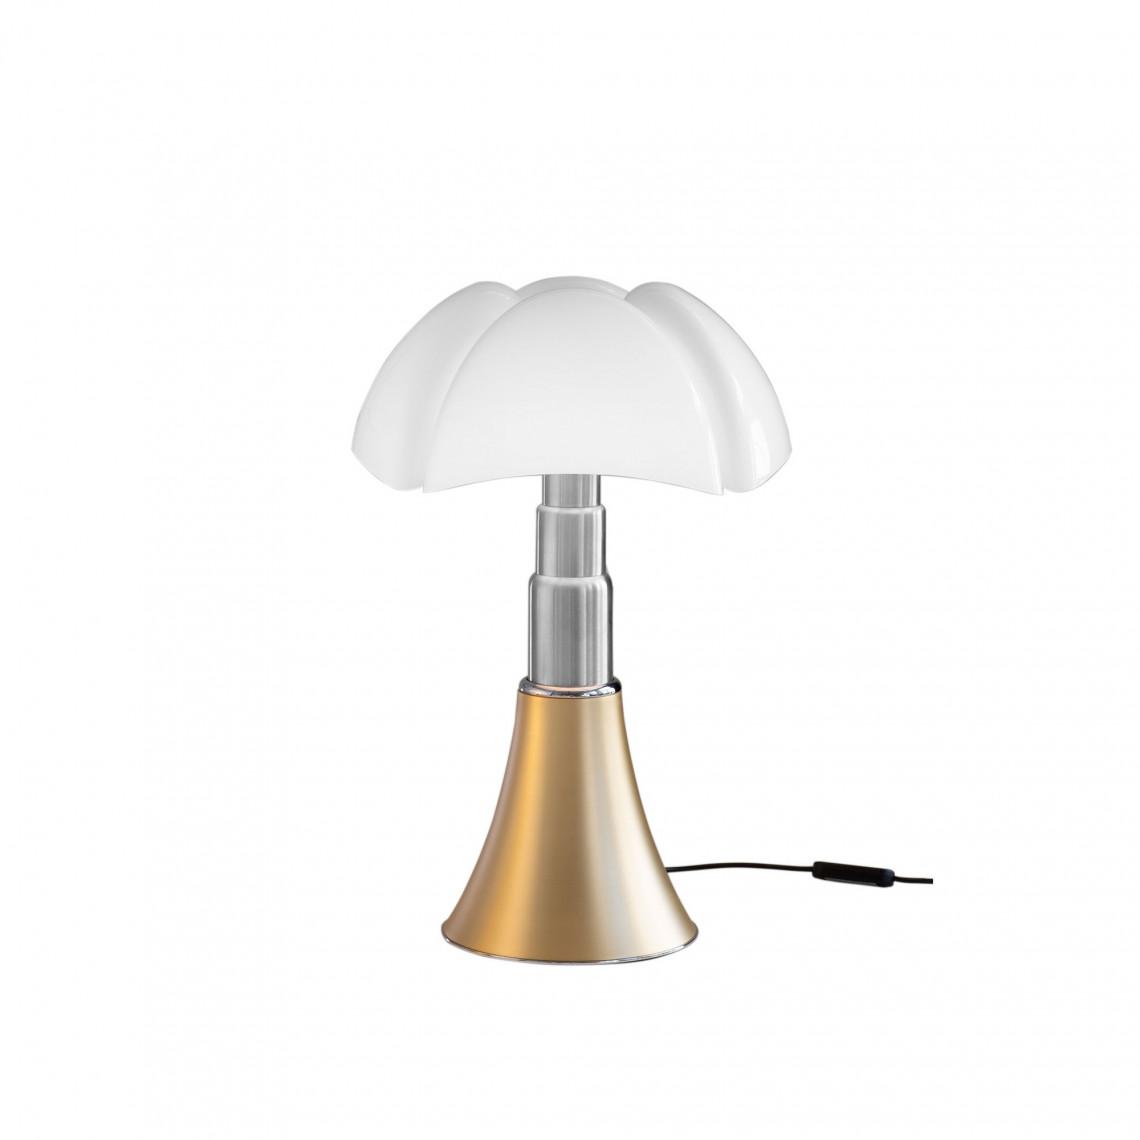 Pipistrello Medium Table Lamp Brass - Dimbar